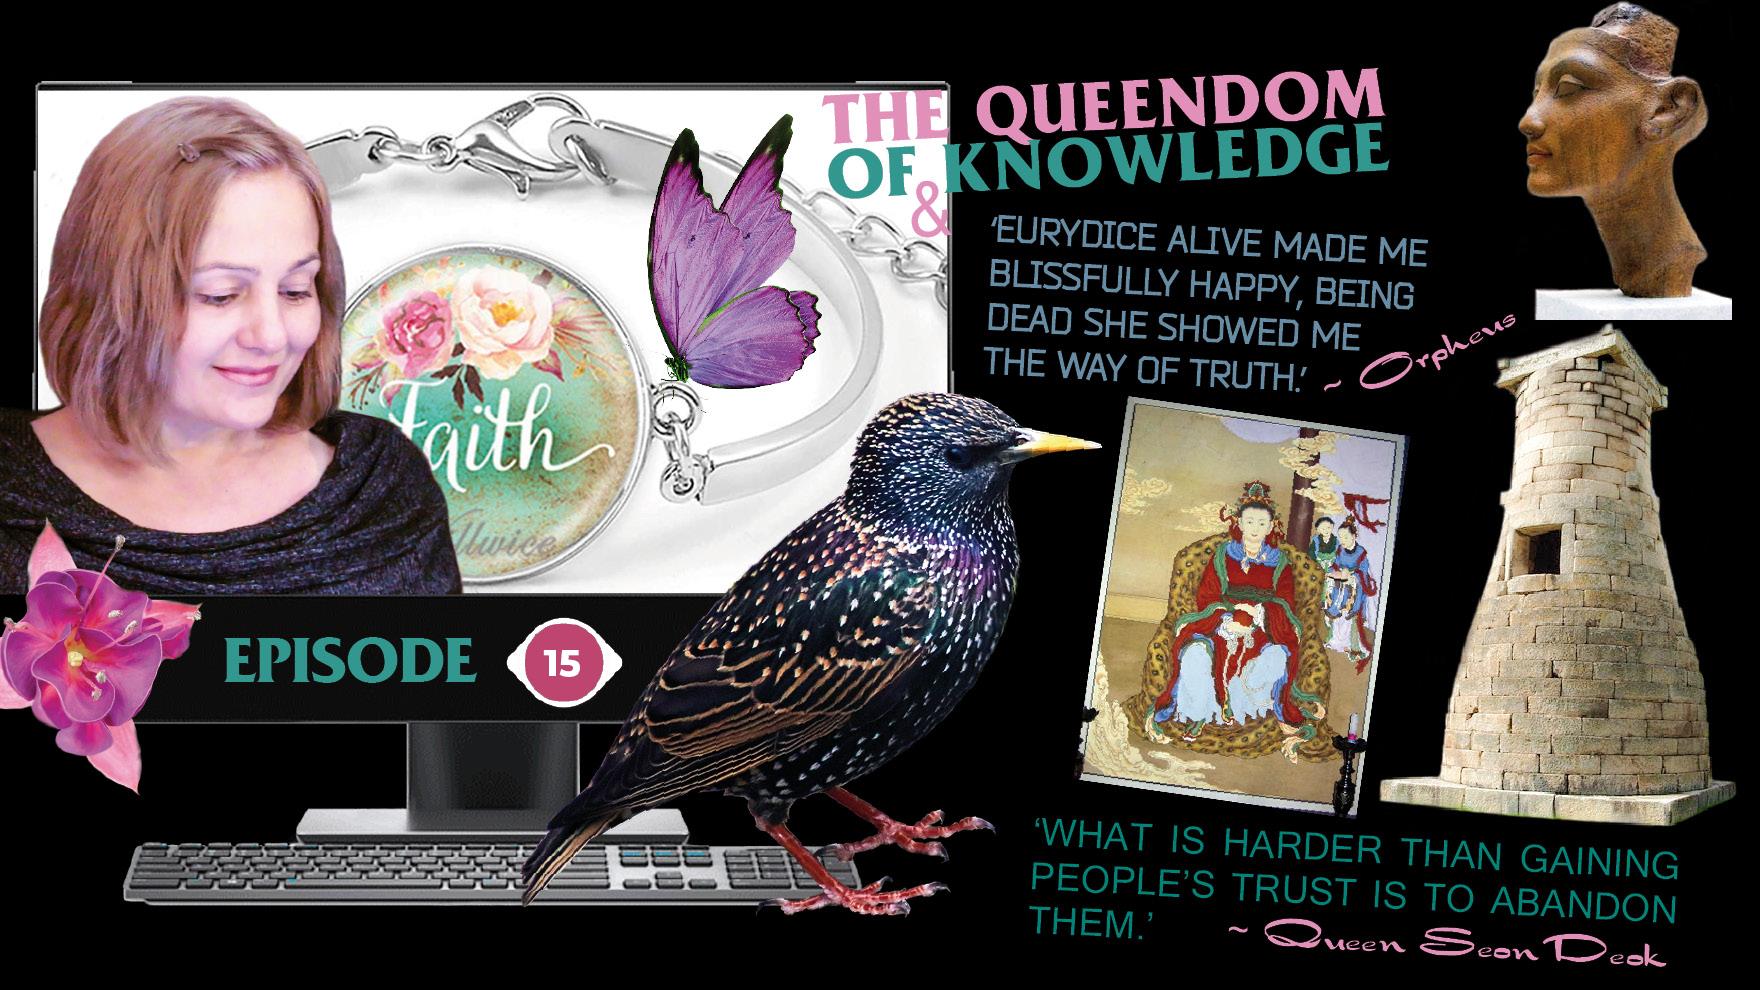 Прекрасните кралици и техният поиск за Светлина и Единство: Найтбърд, Сондок, Нефертити, Евридика / The lovely queens and their quest for Light & Unity: Nightbirde, Seondeok, Nefertiti, Eurydice